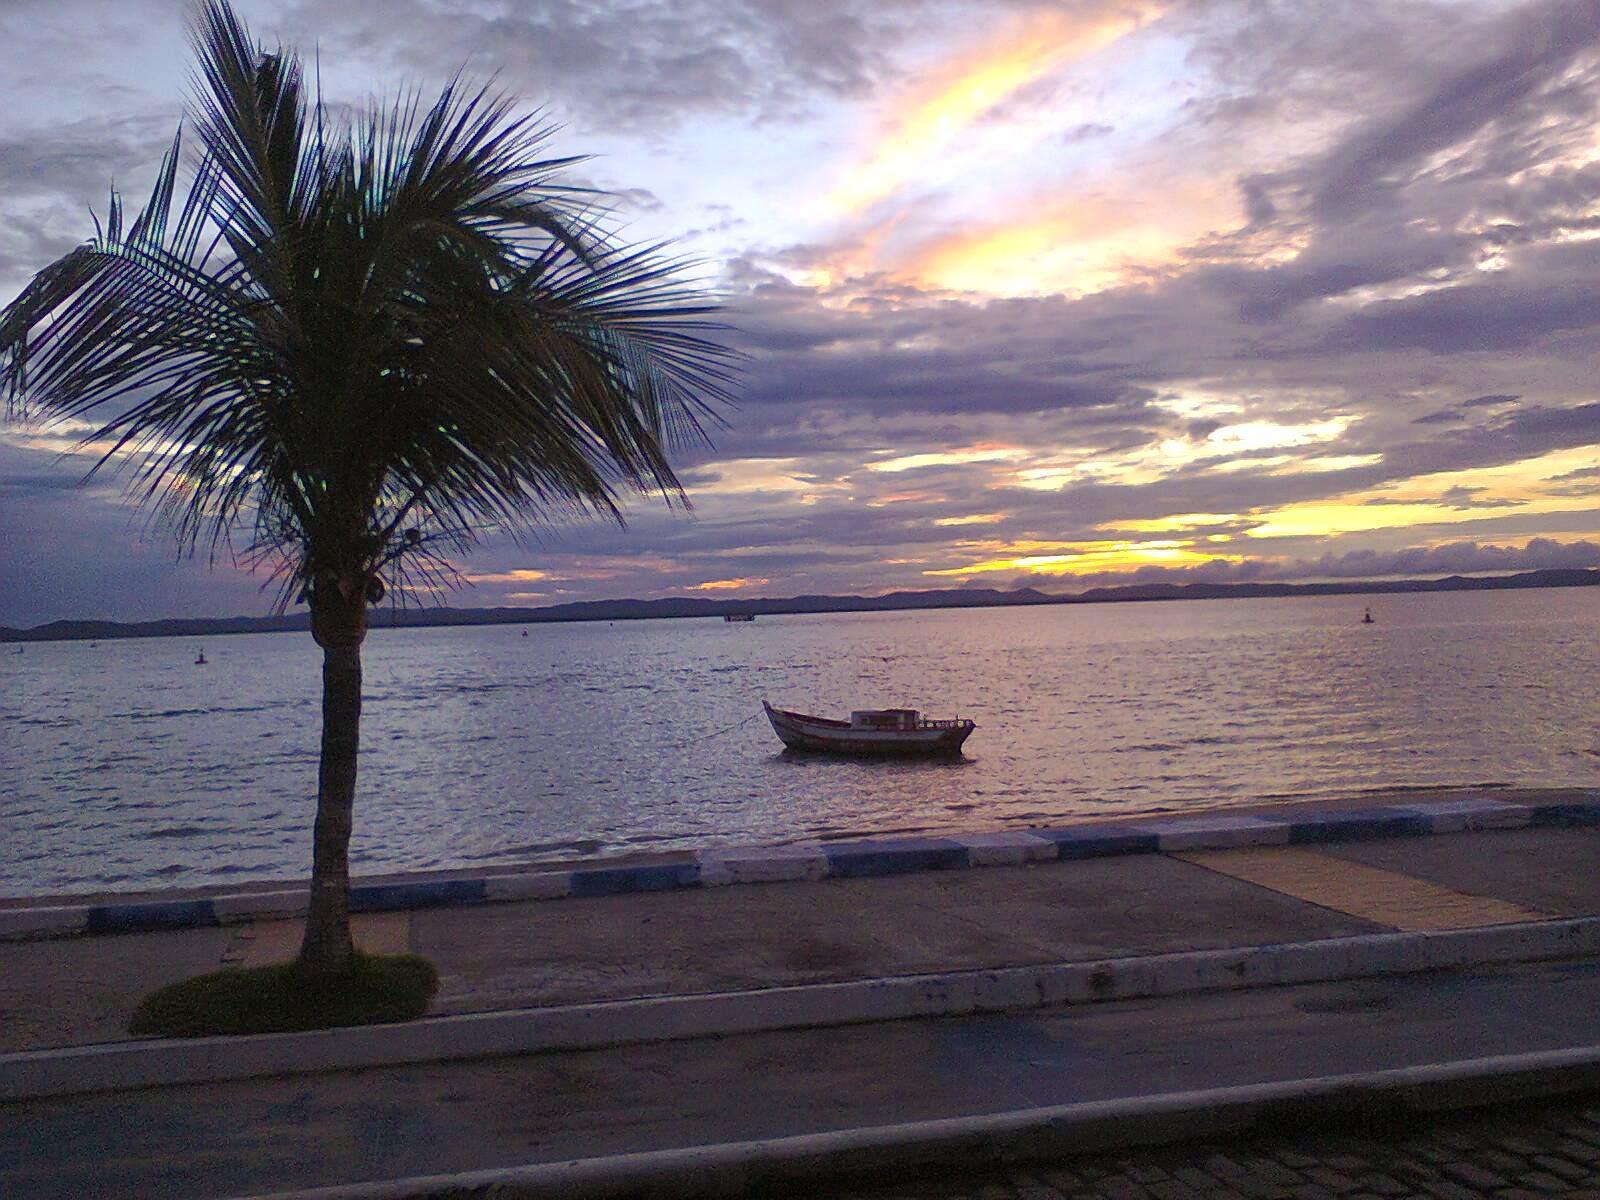 Ilha de Itaparica/Bahia